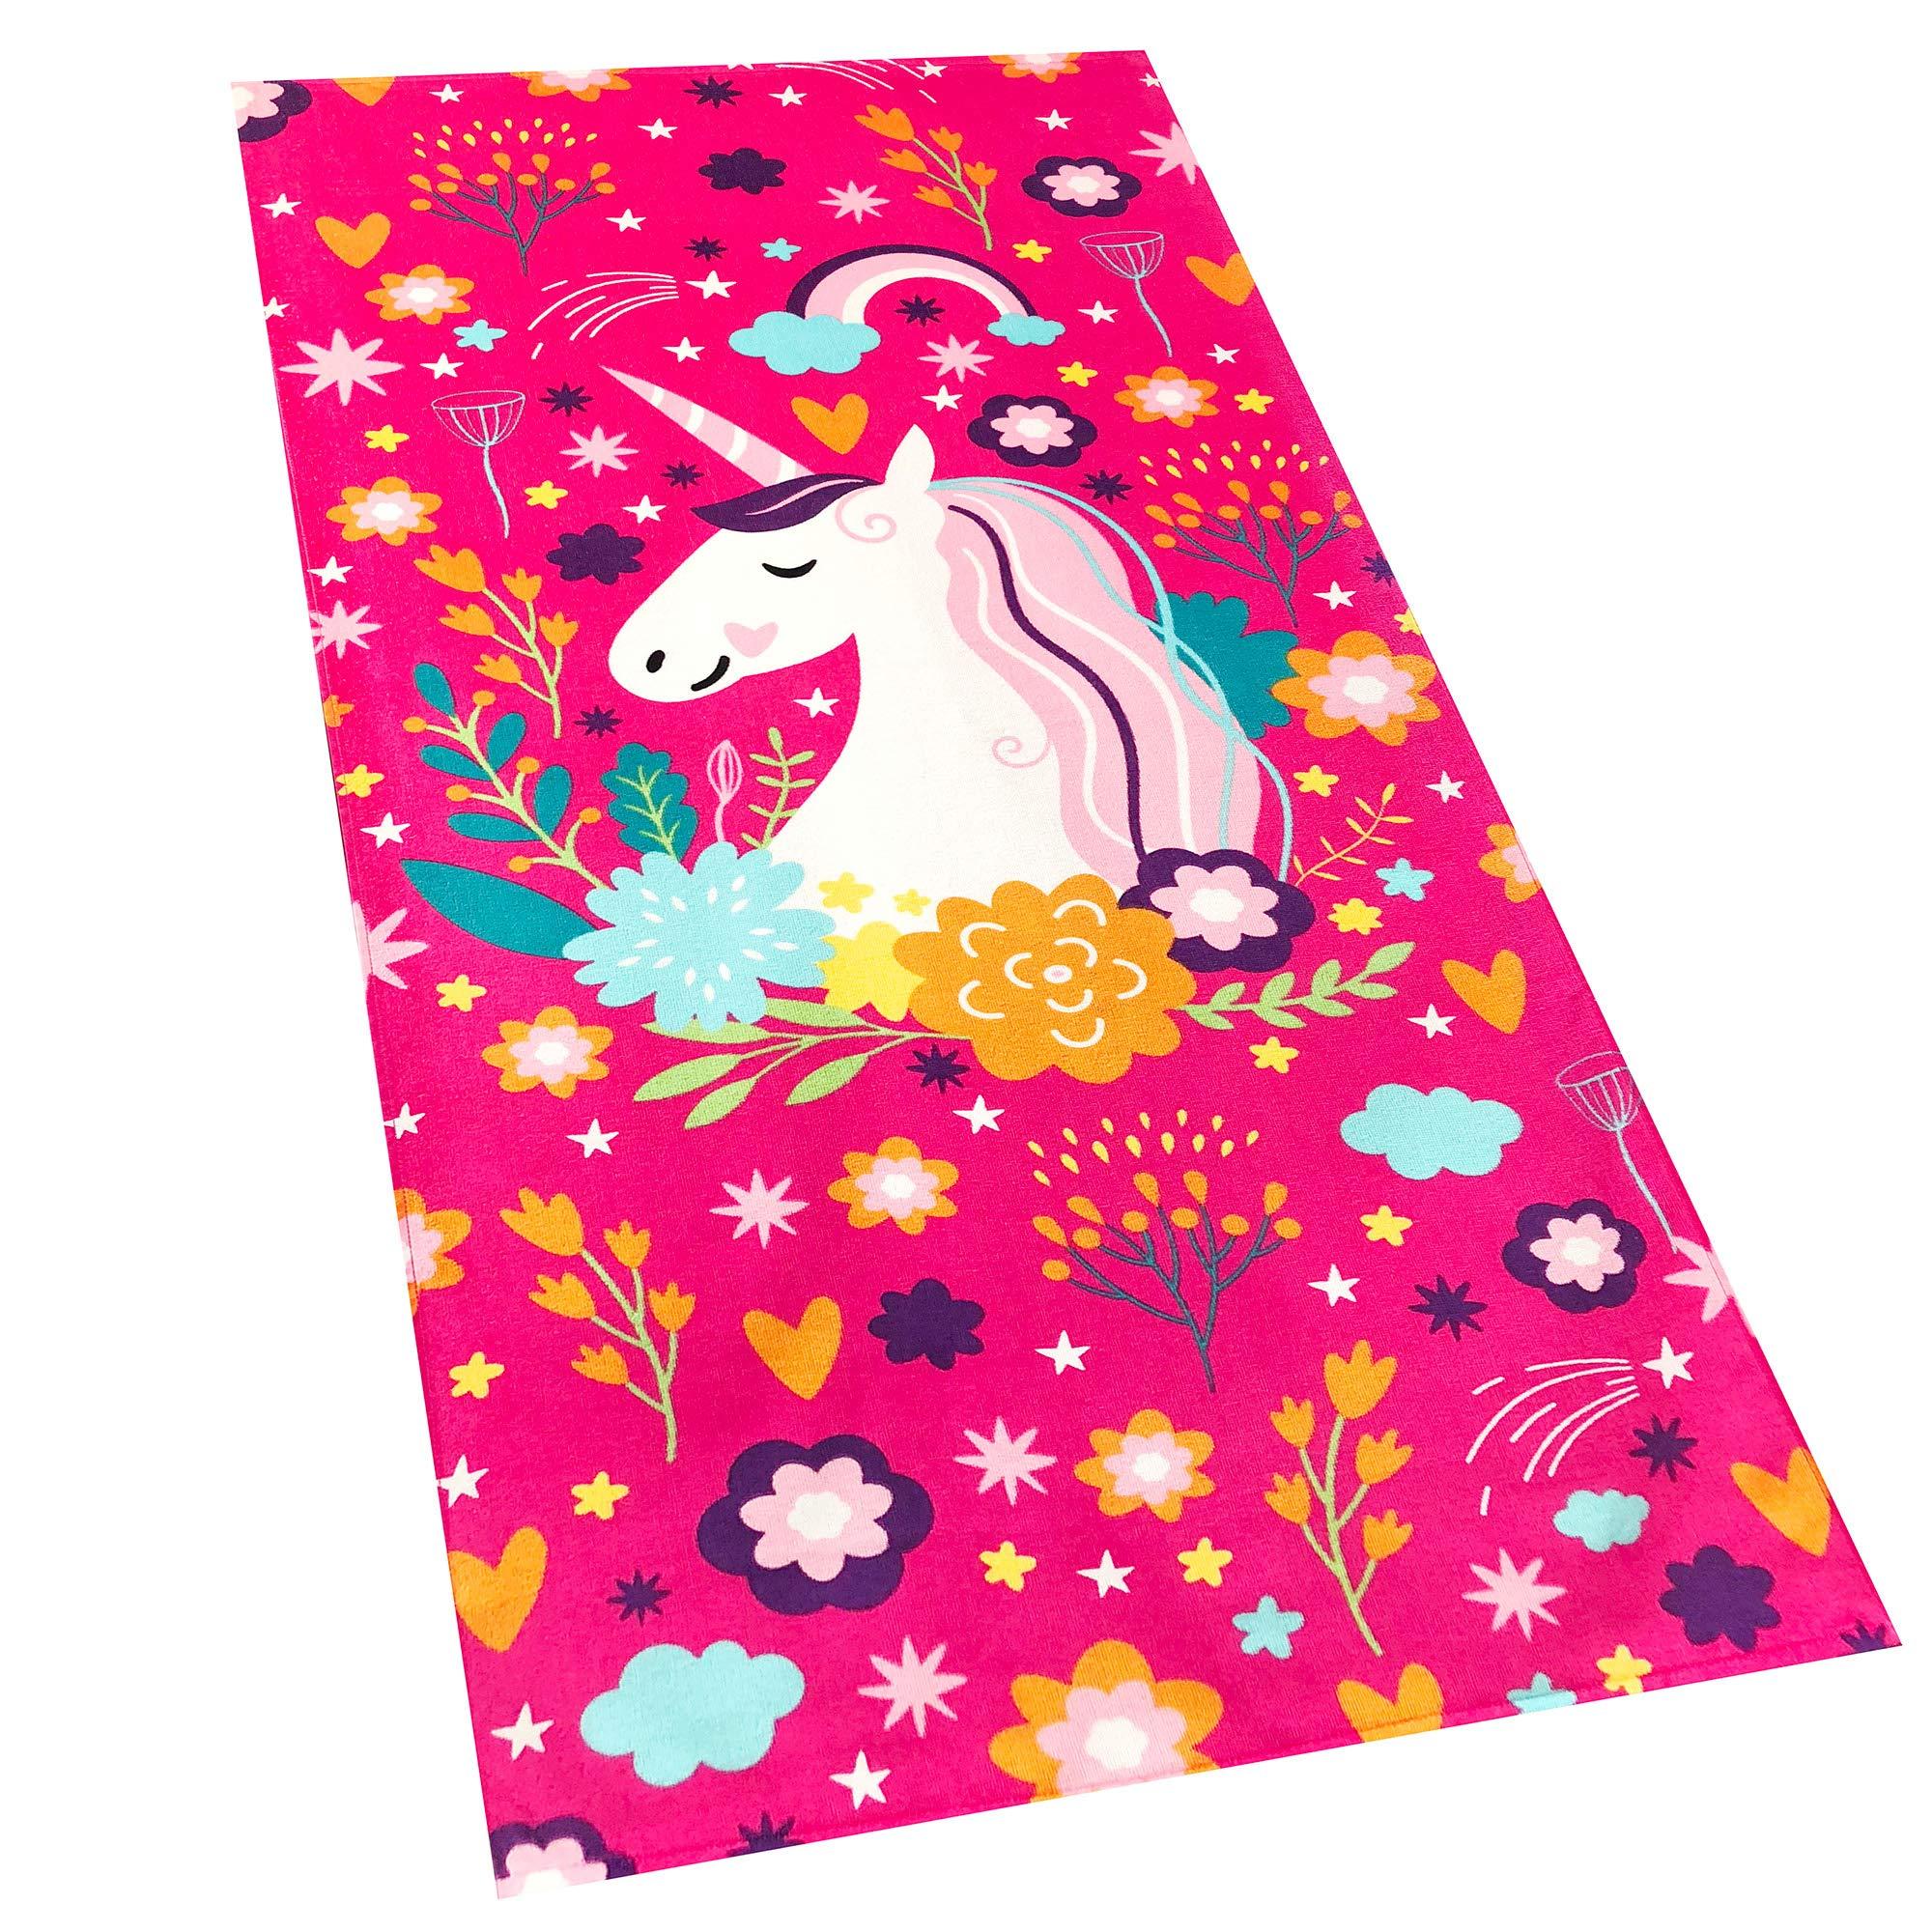 Softerry Love Unicorn Beach Towel Pink Fantasy Rainbow 30 x 60 inches 100% Cotton Velour